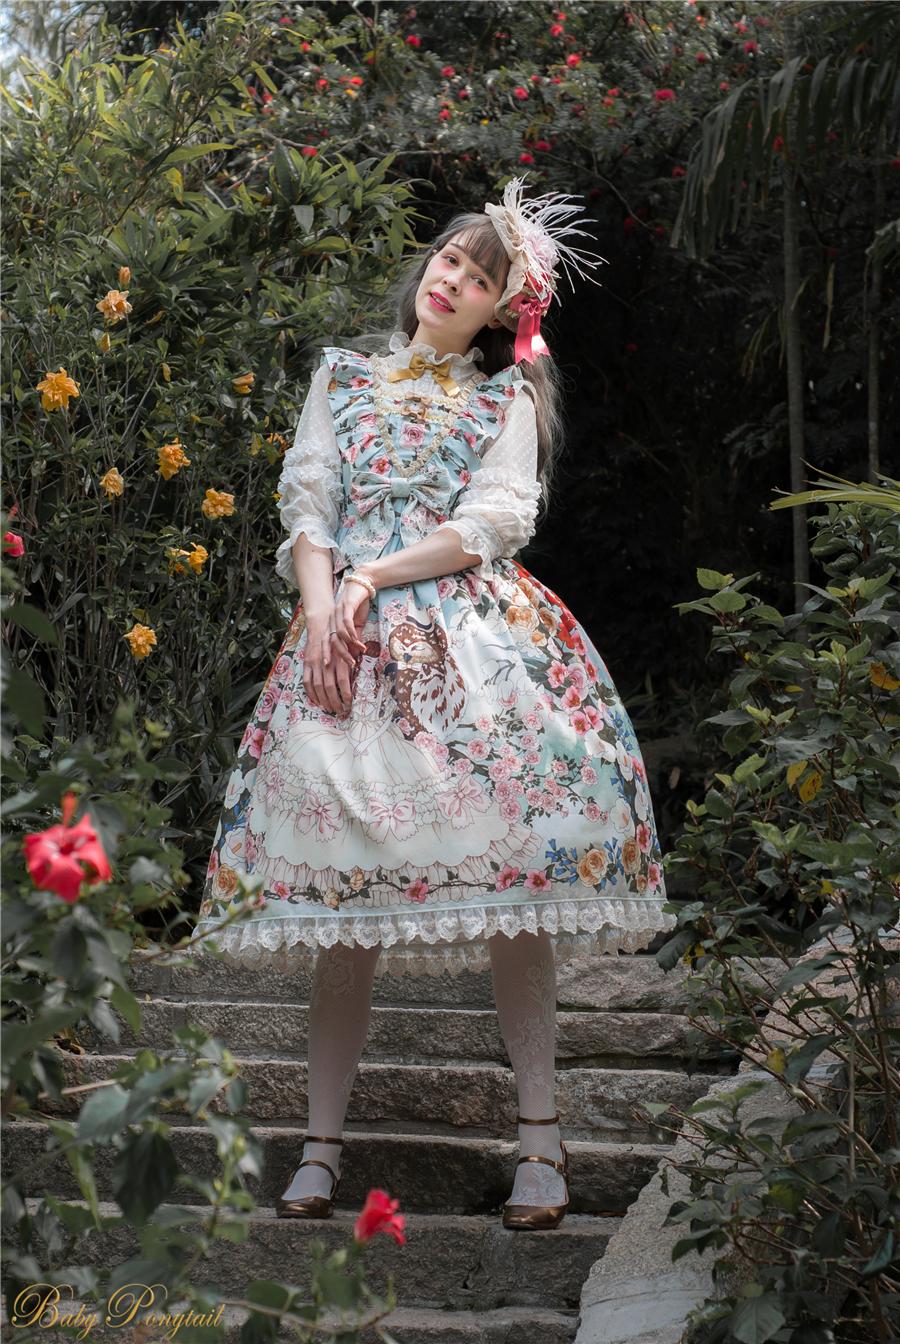 Baby Ponytail_Model Photo_Polly's Garden of Dreams_JSK Sky_Claudia15.jpg